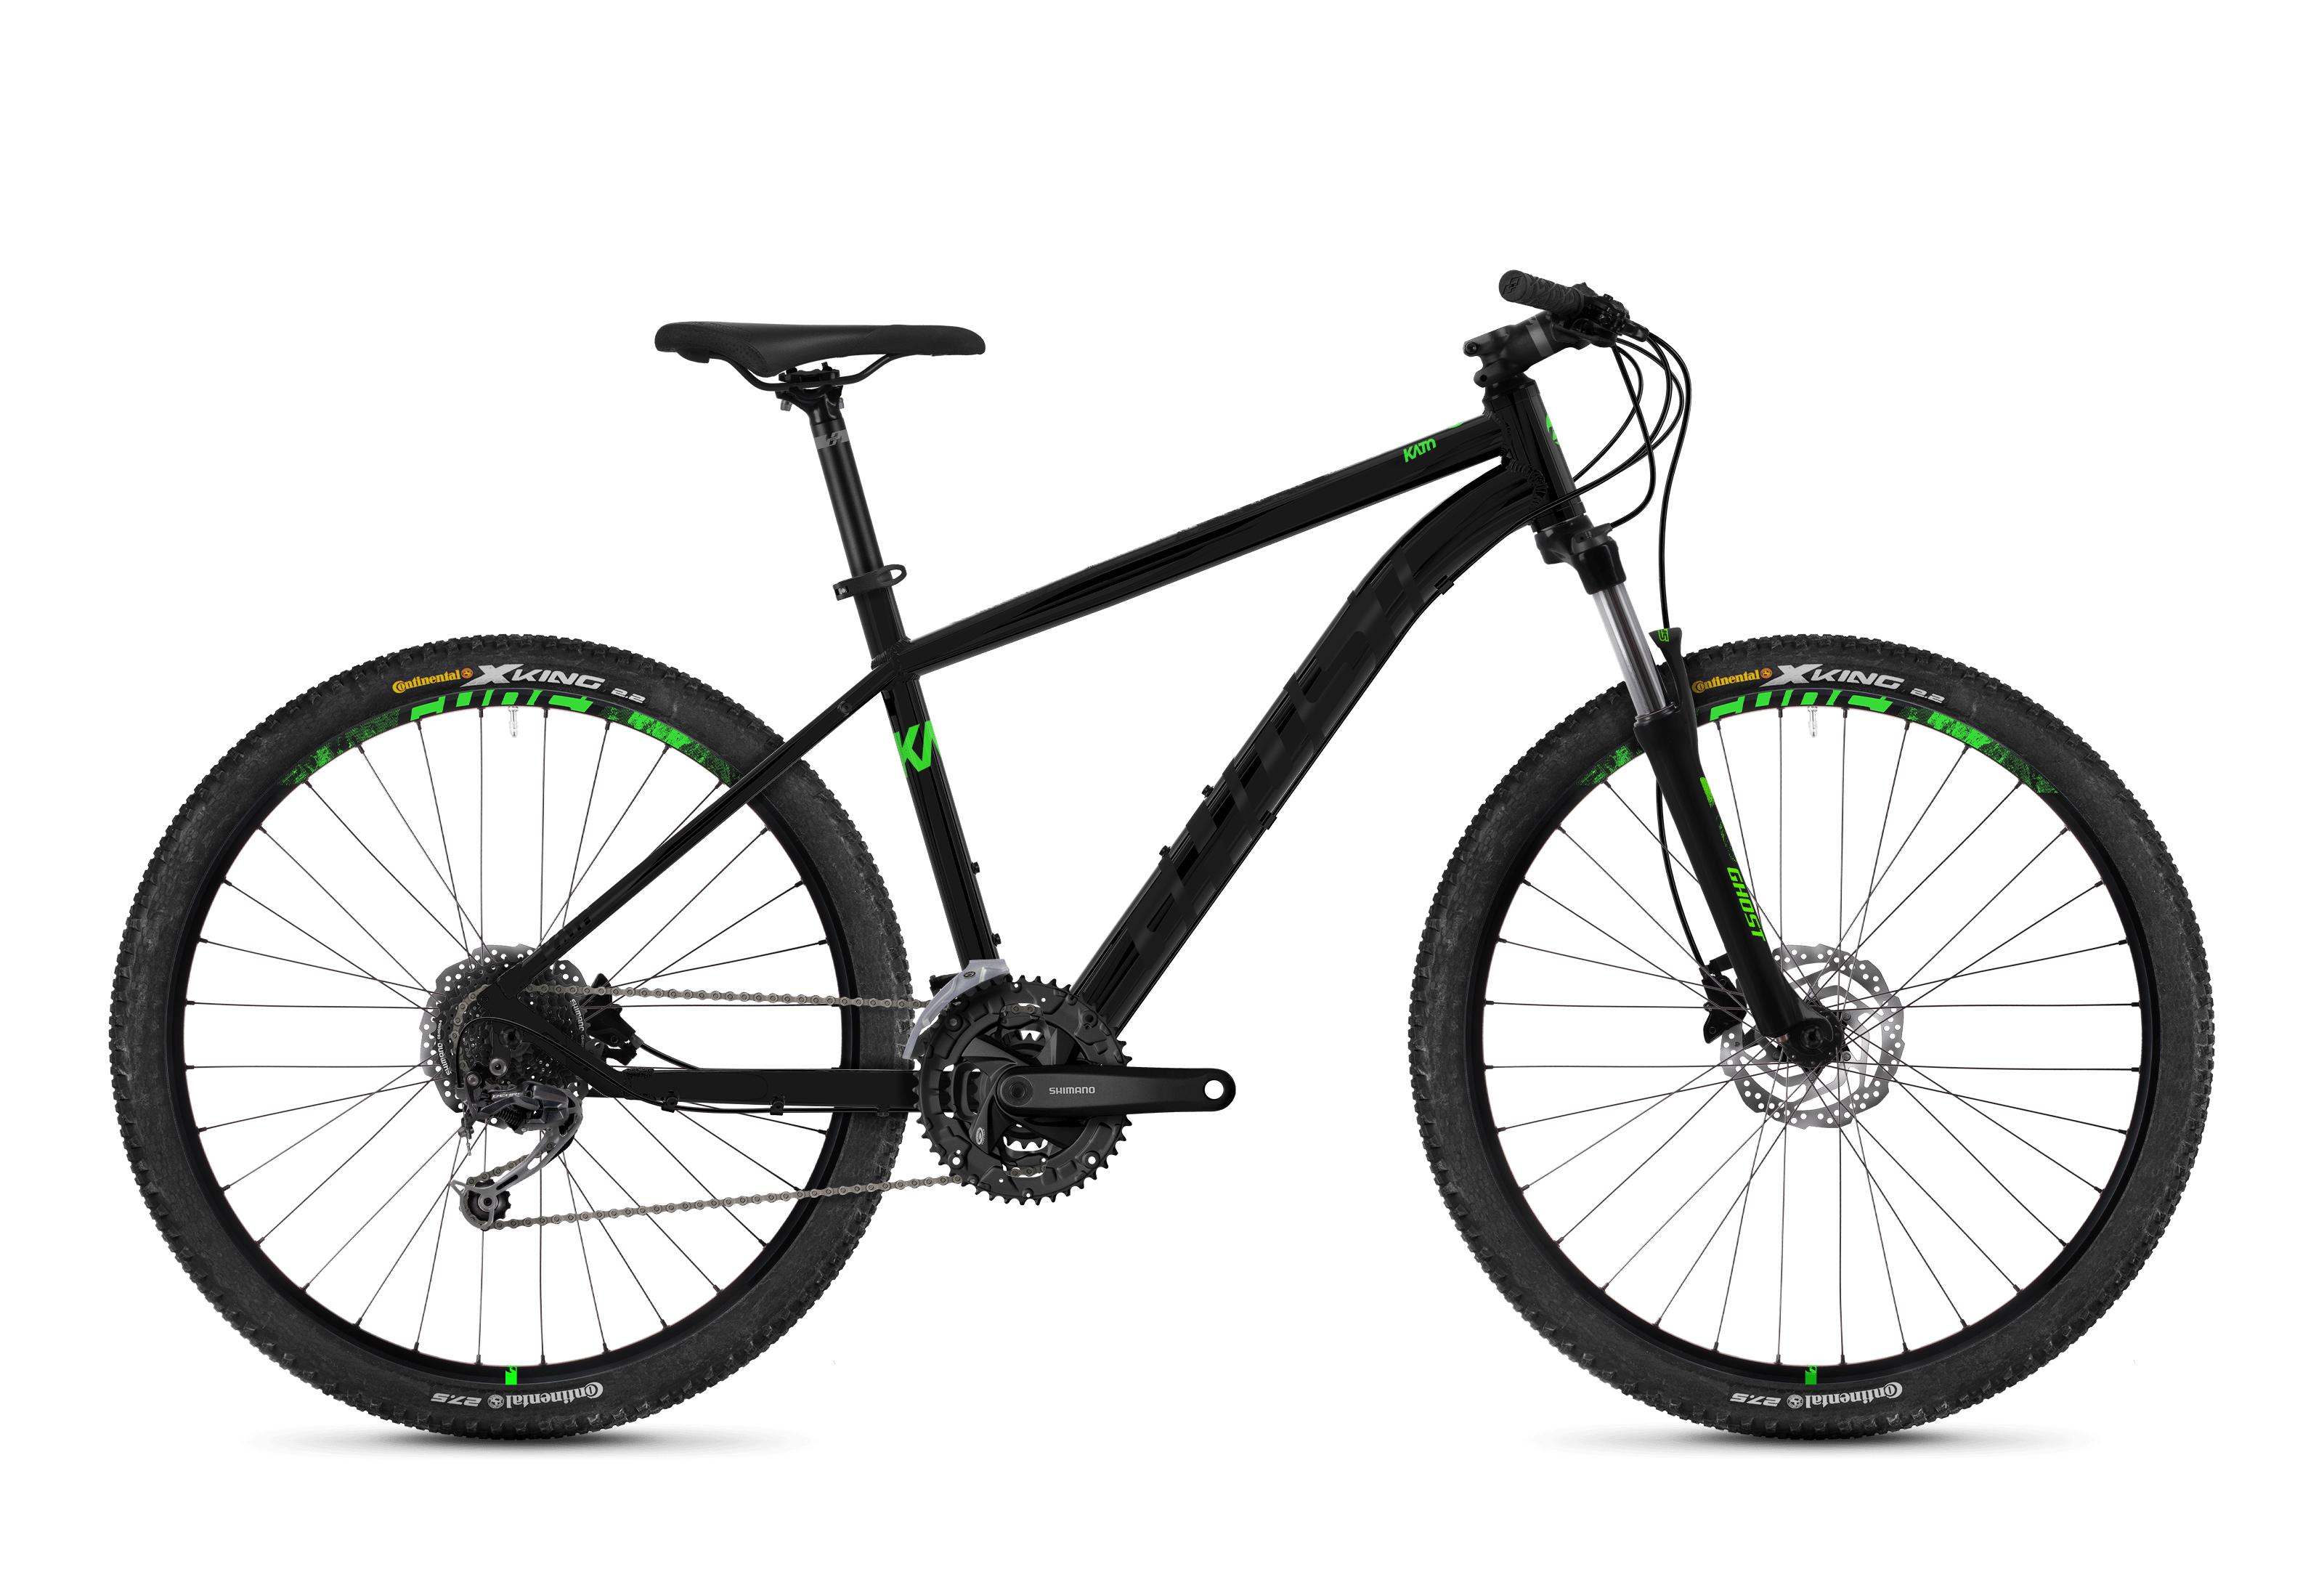 Horské kolo GHOST Kato 4.7 black / green XS 2018